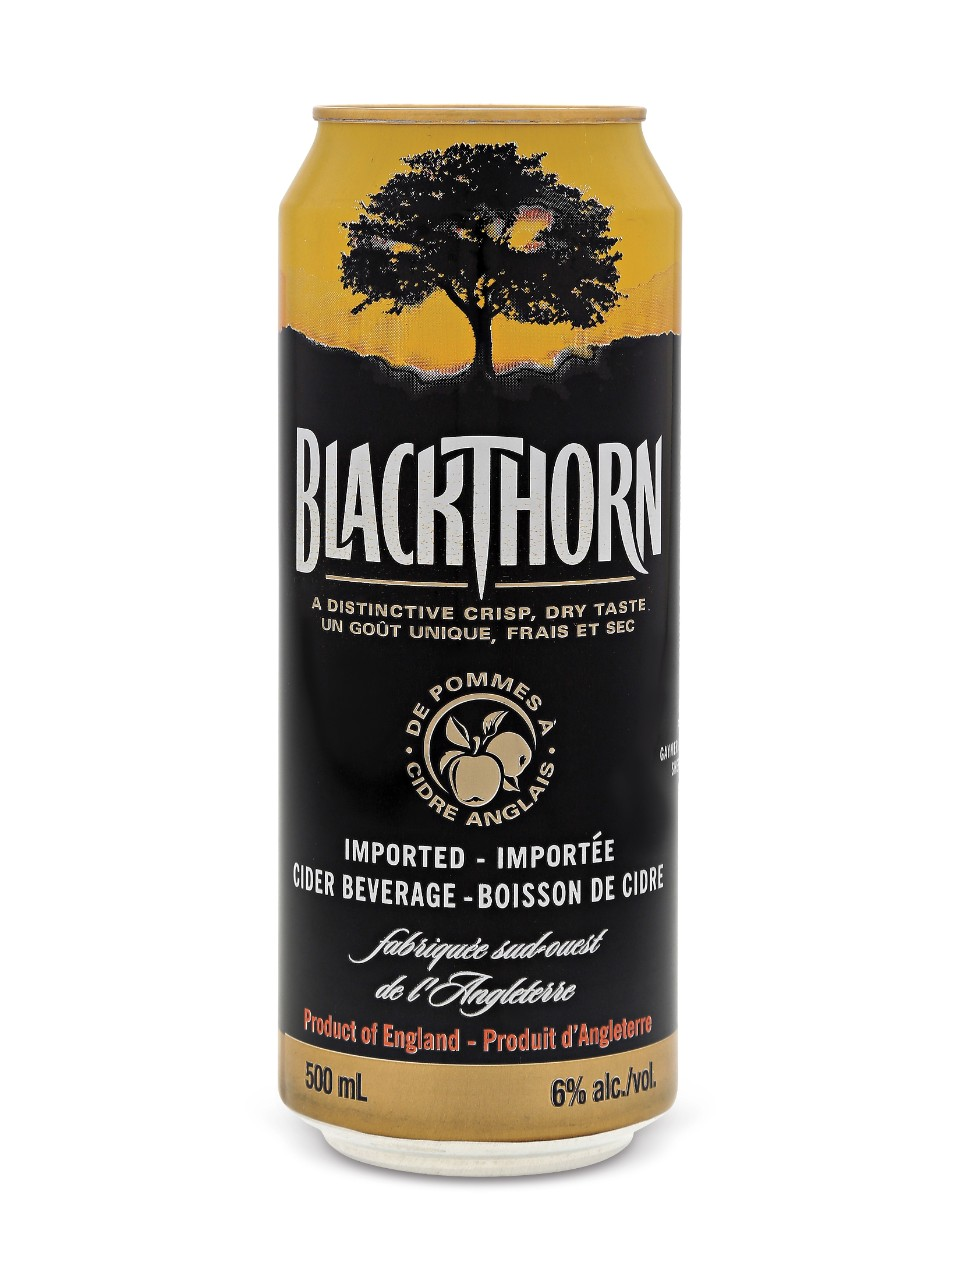 Blackthorn Cider | LCBO